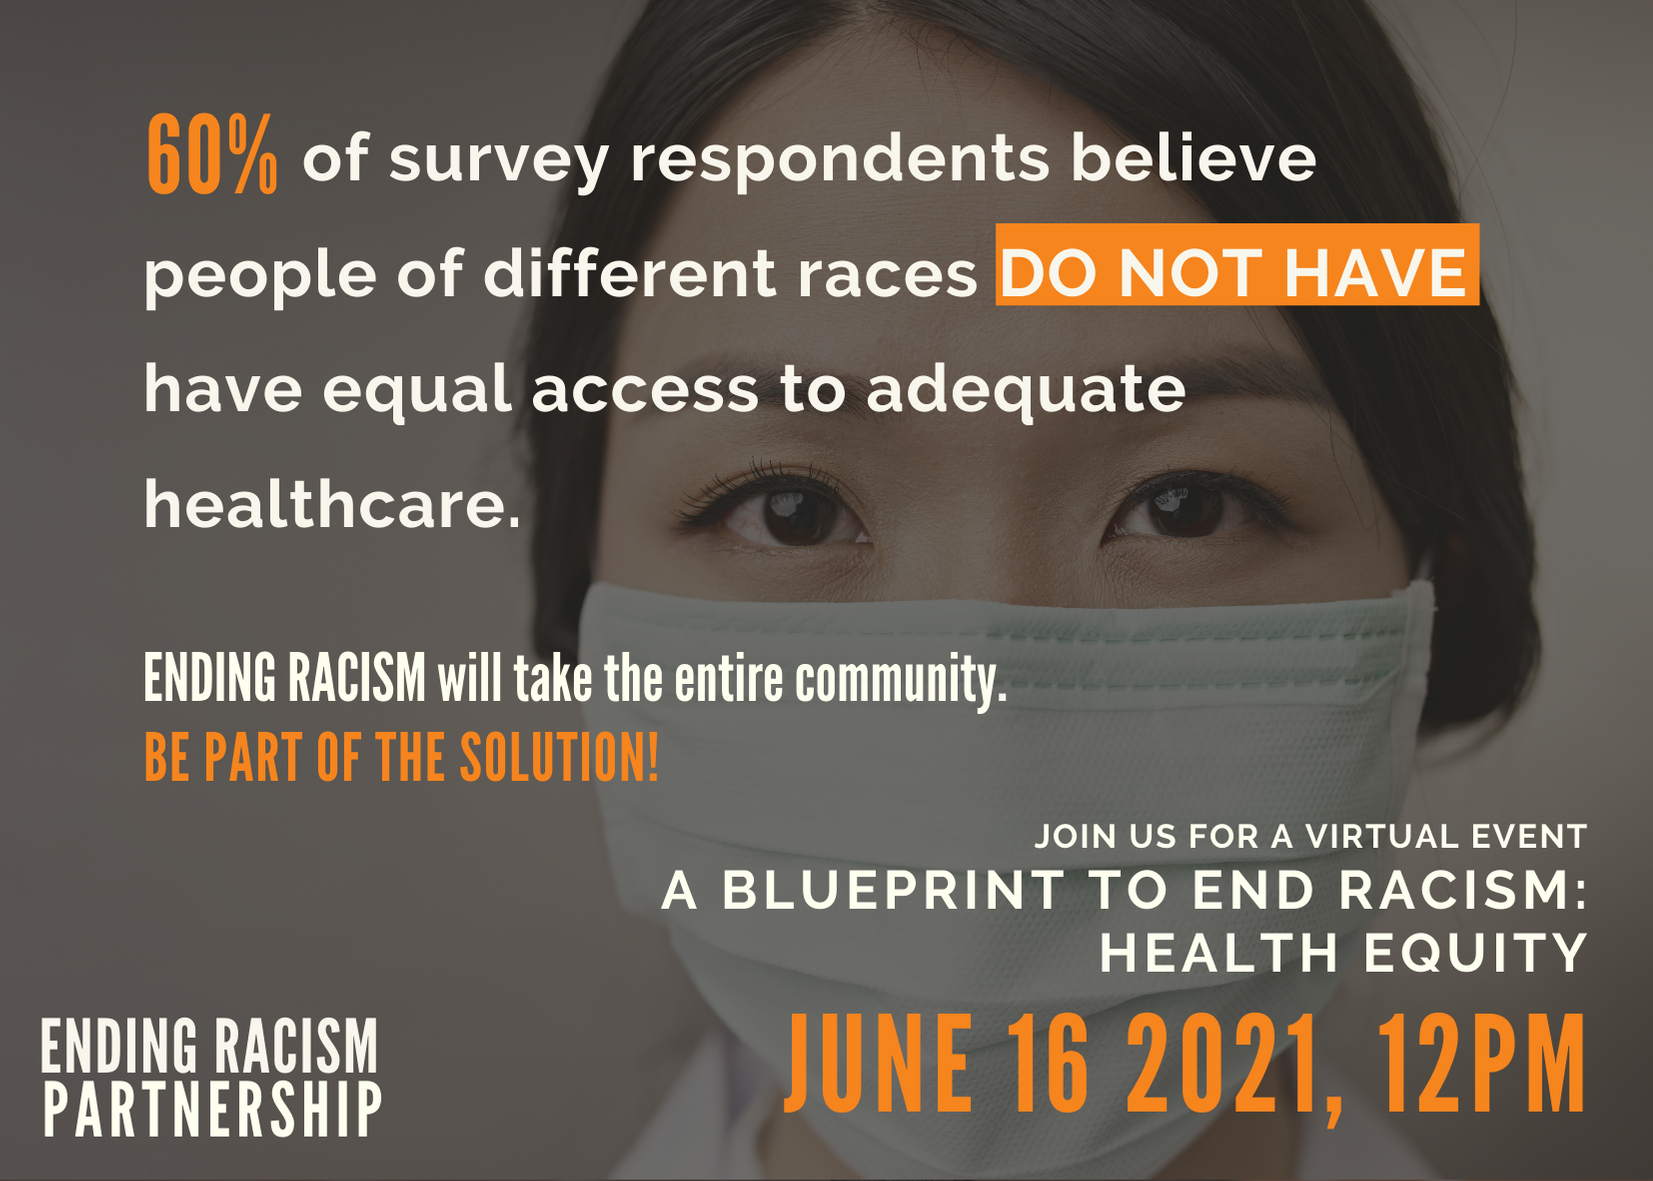 Ending Racism Partnership health equity